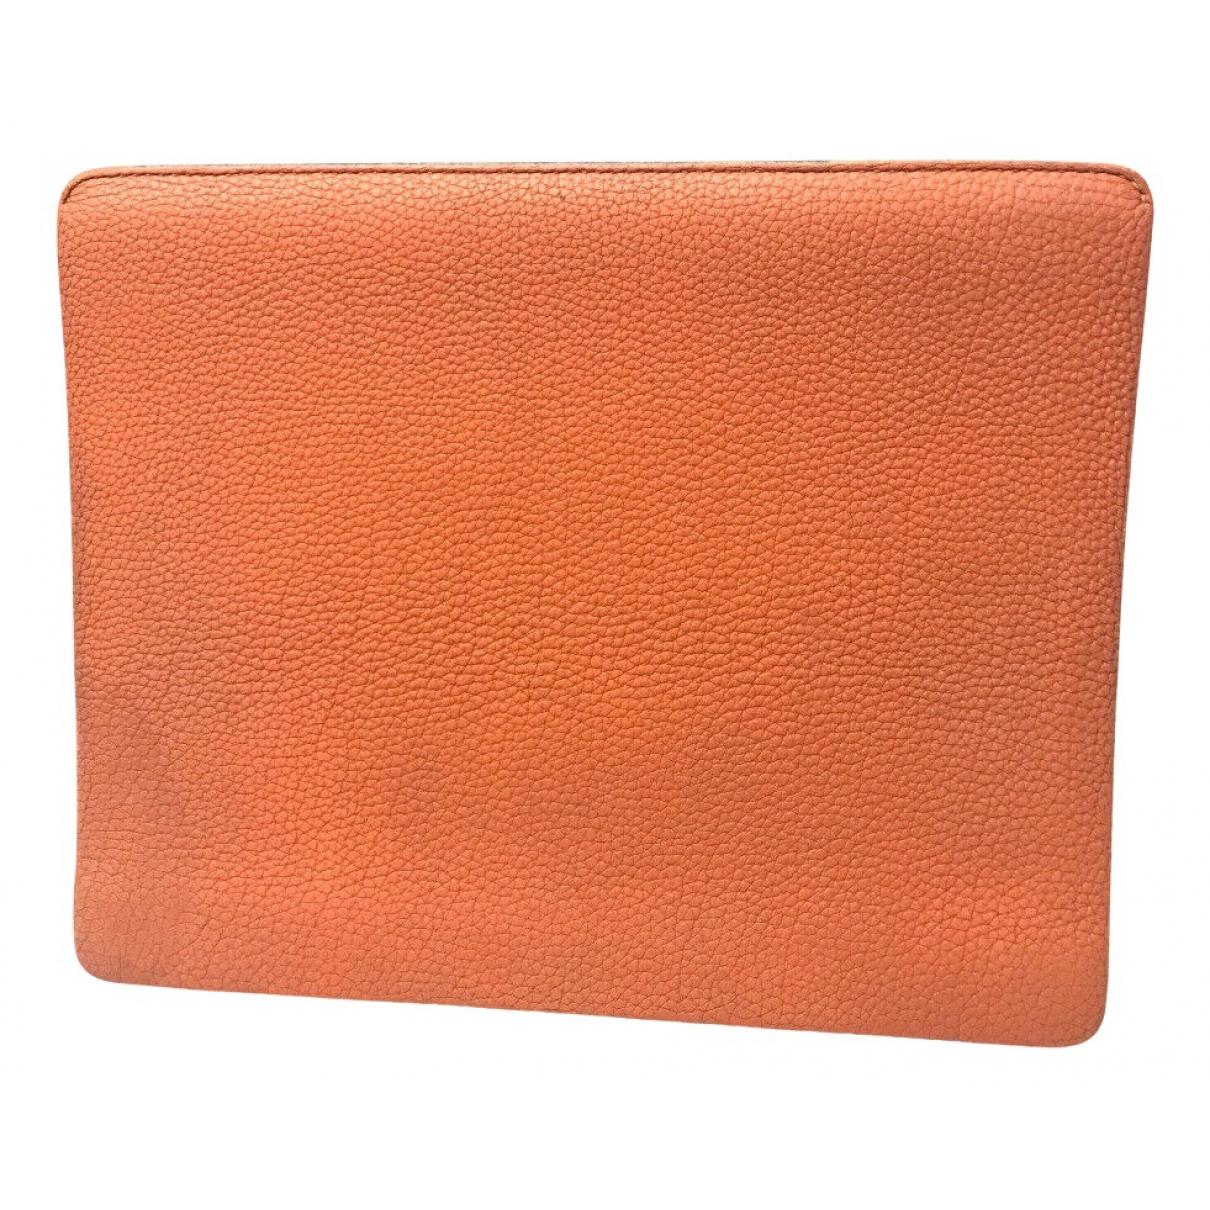 Hermès N Orange Leather Accessories for Life & Living N